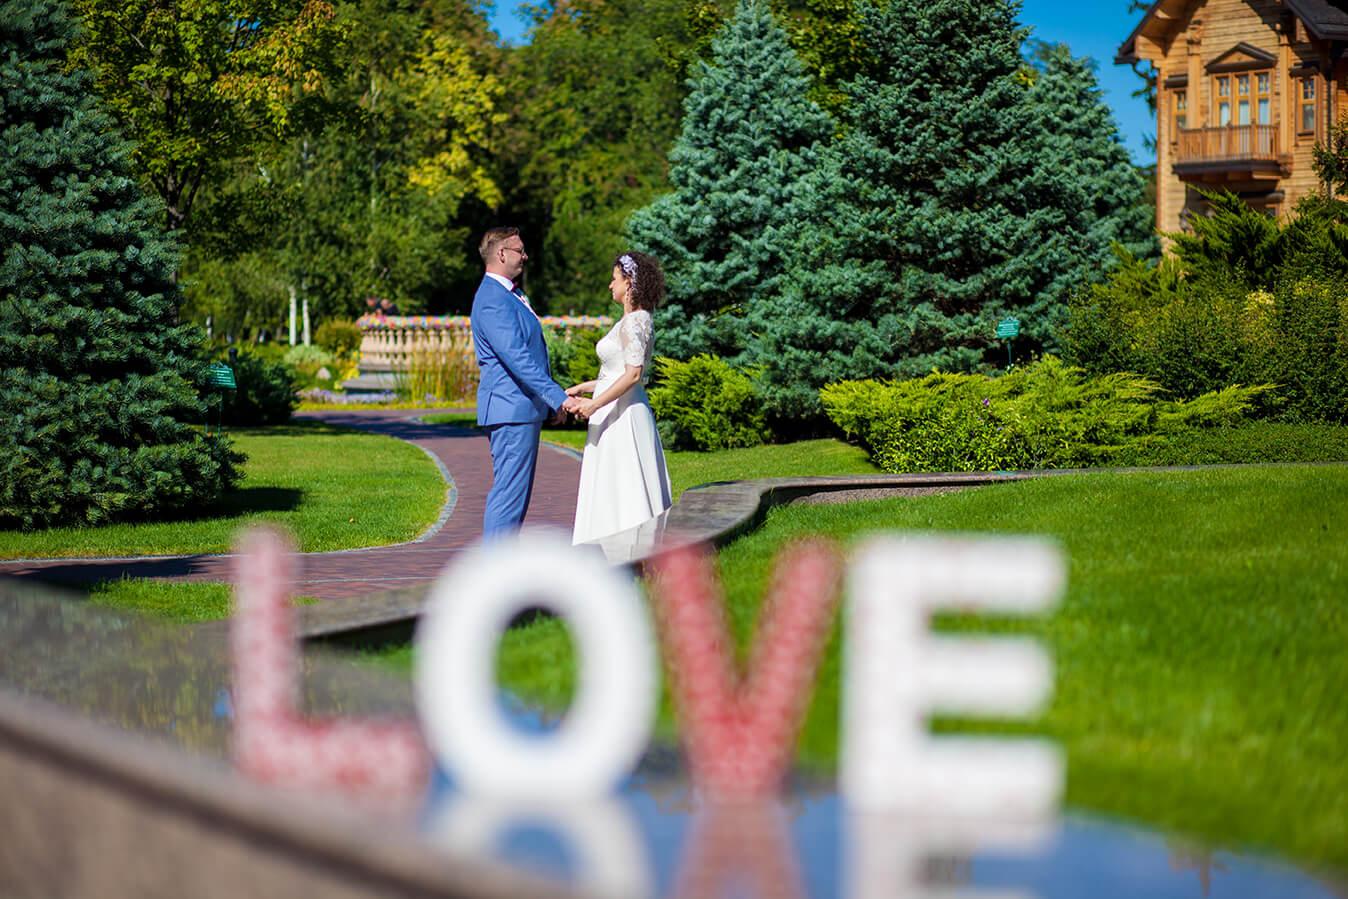 3-svadebnyj-fotograf-videooperator-svadebnoe-foto-idei-kiev-46